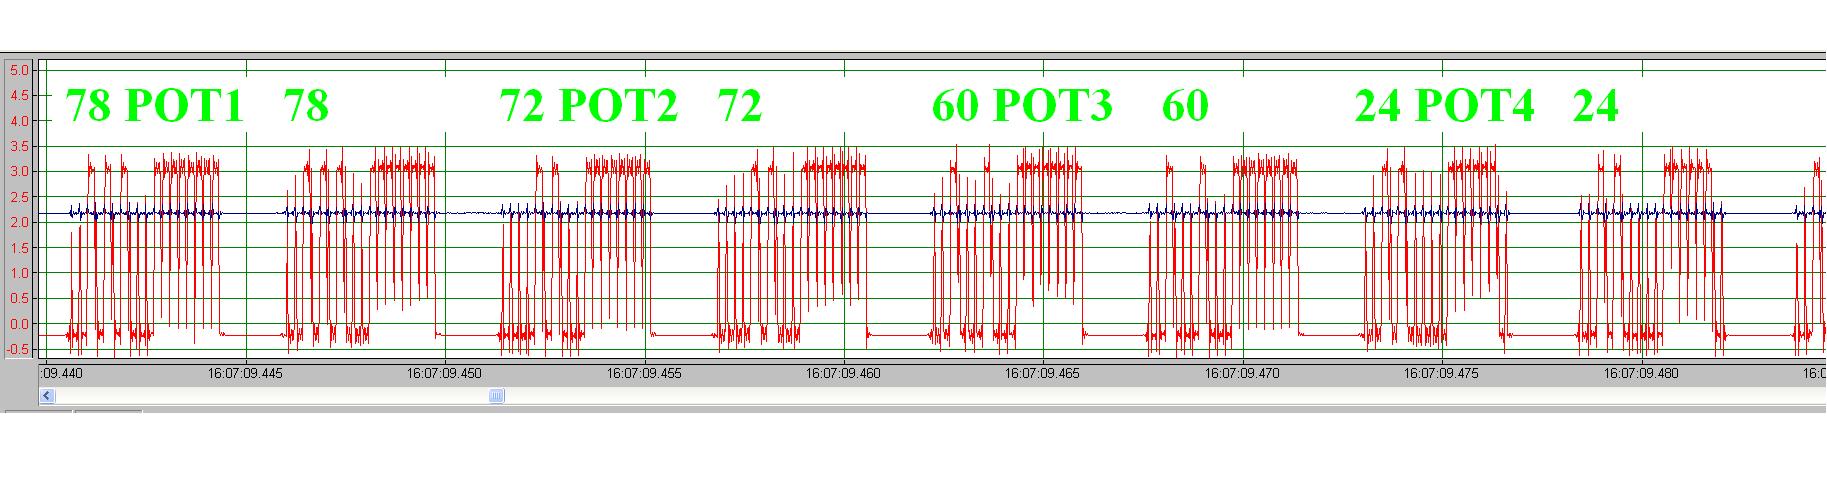 Marklin 4 adresy 4 potencjometry  z Visuino ESP32 240MHz i PCF8591 .PNG